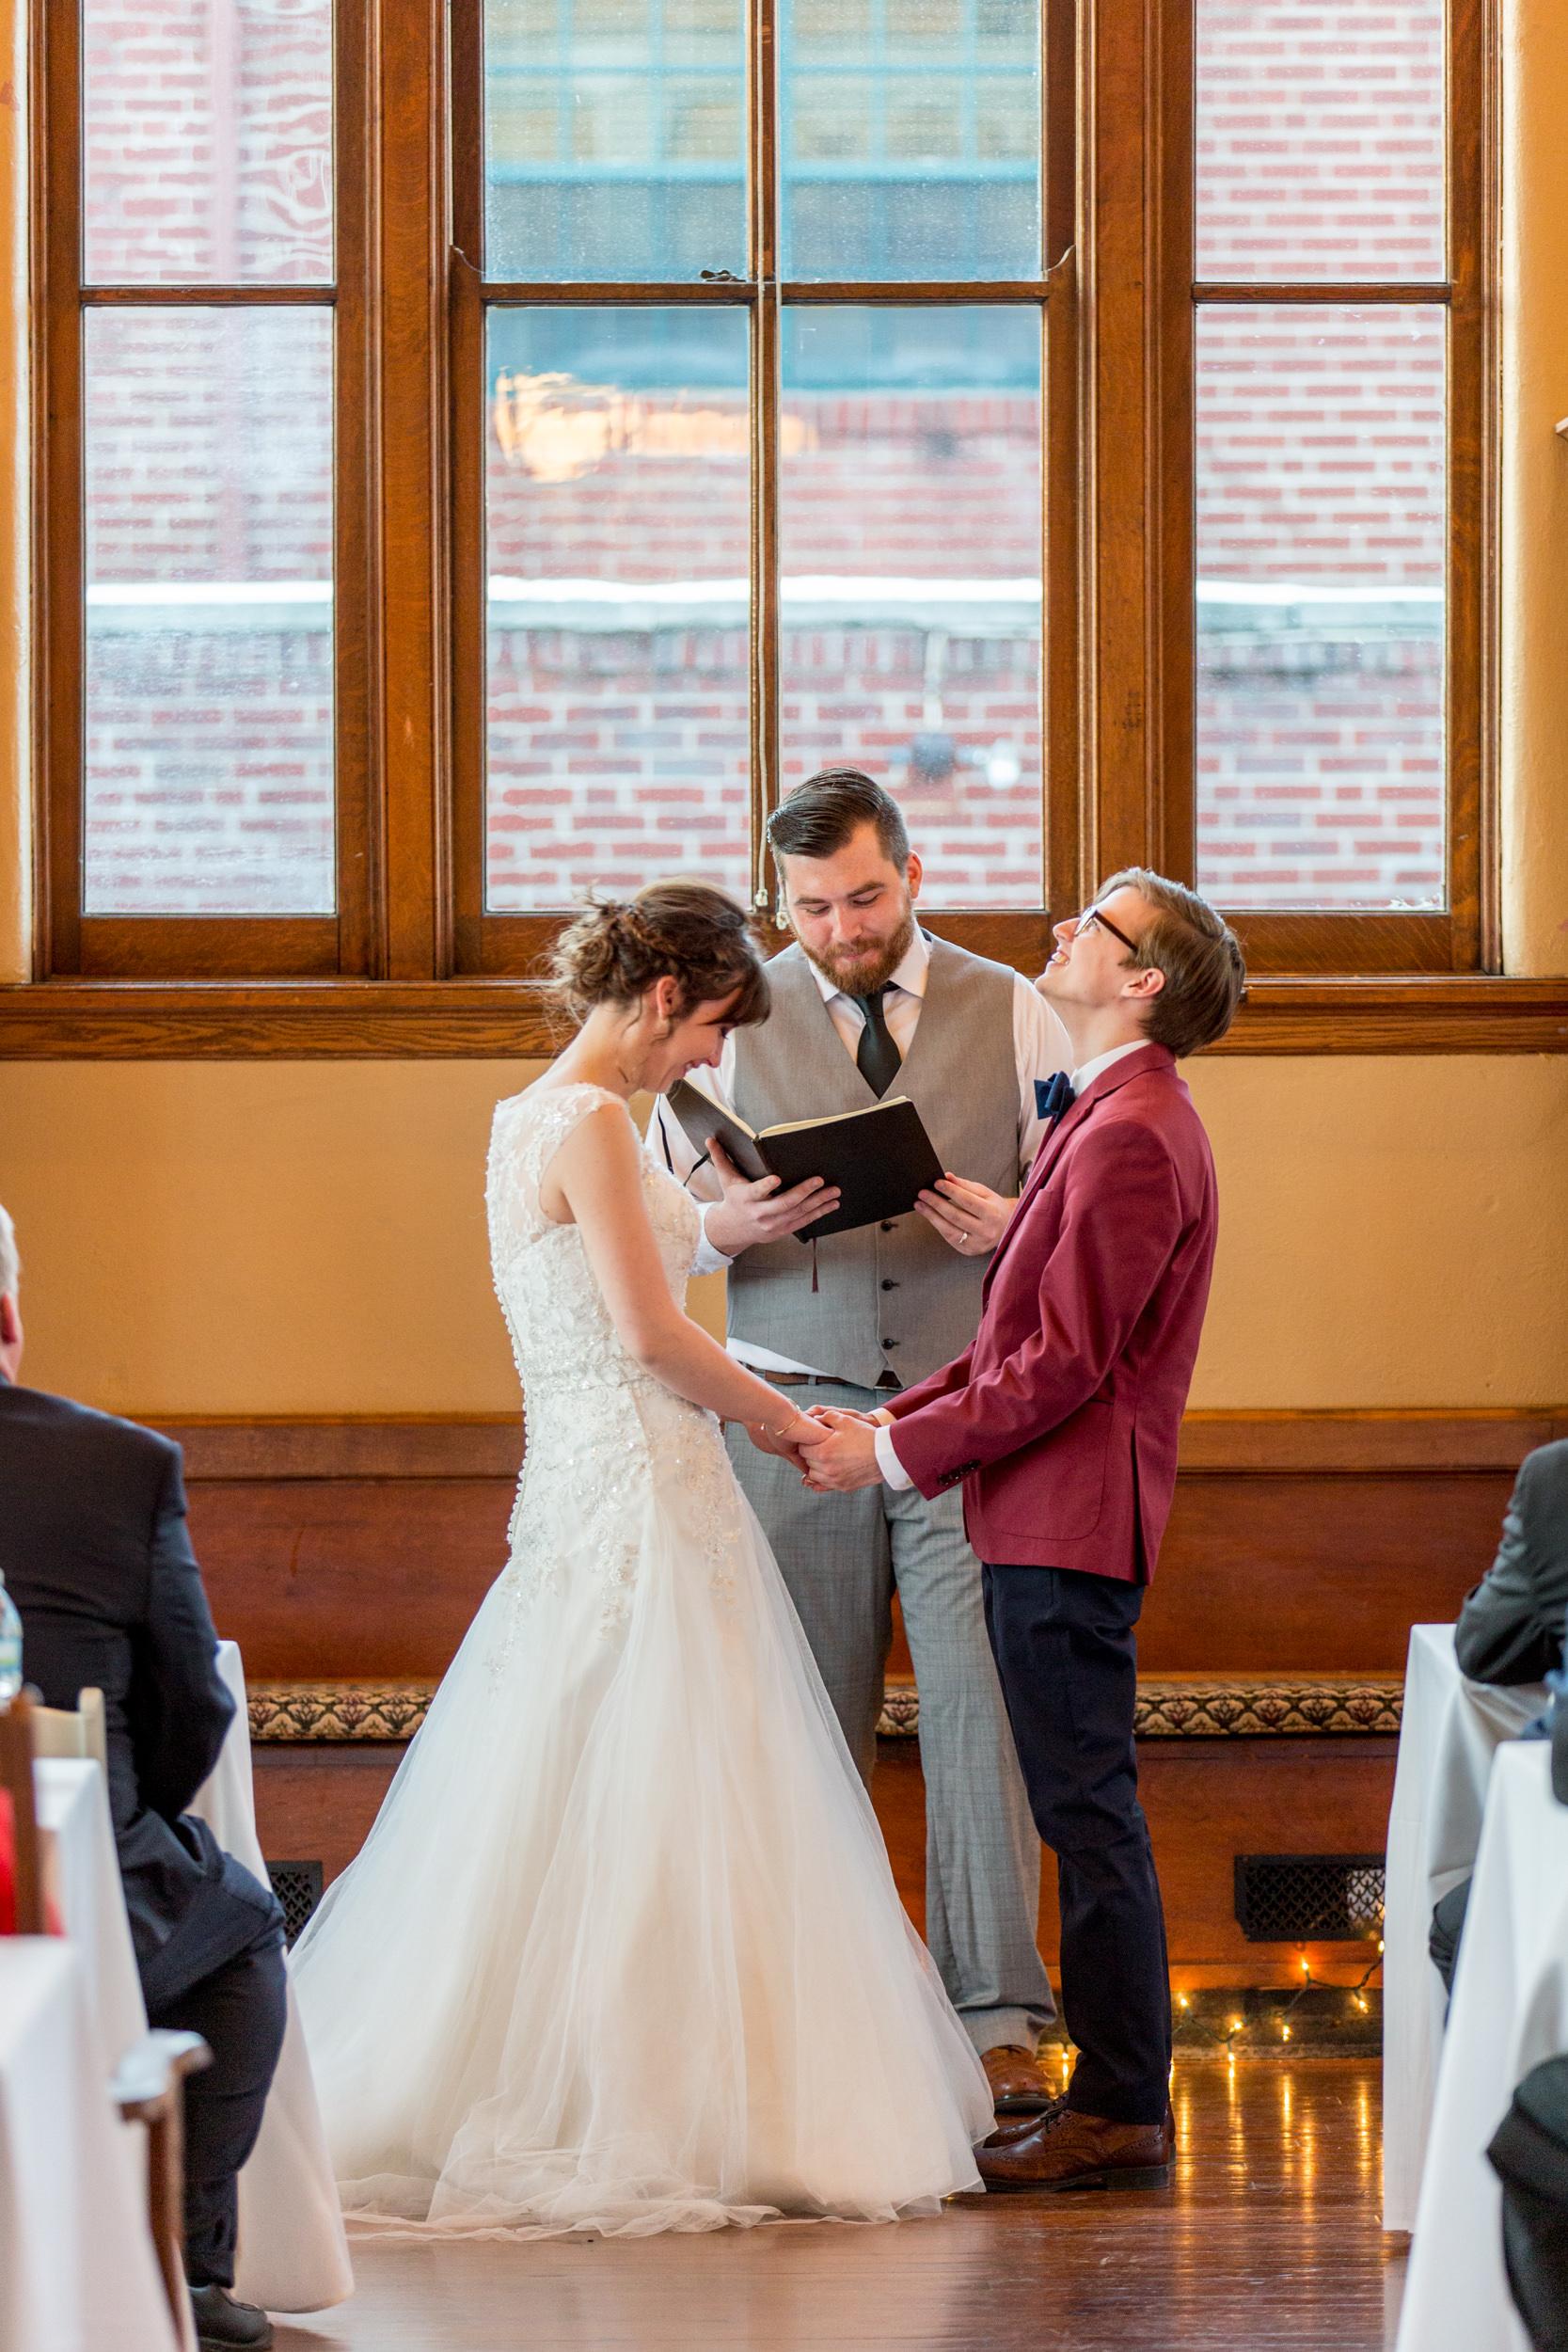 TheSmythCollective-Best-Cincinnati-Wedding-Photographer-021.jpg